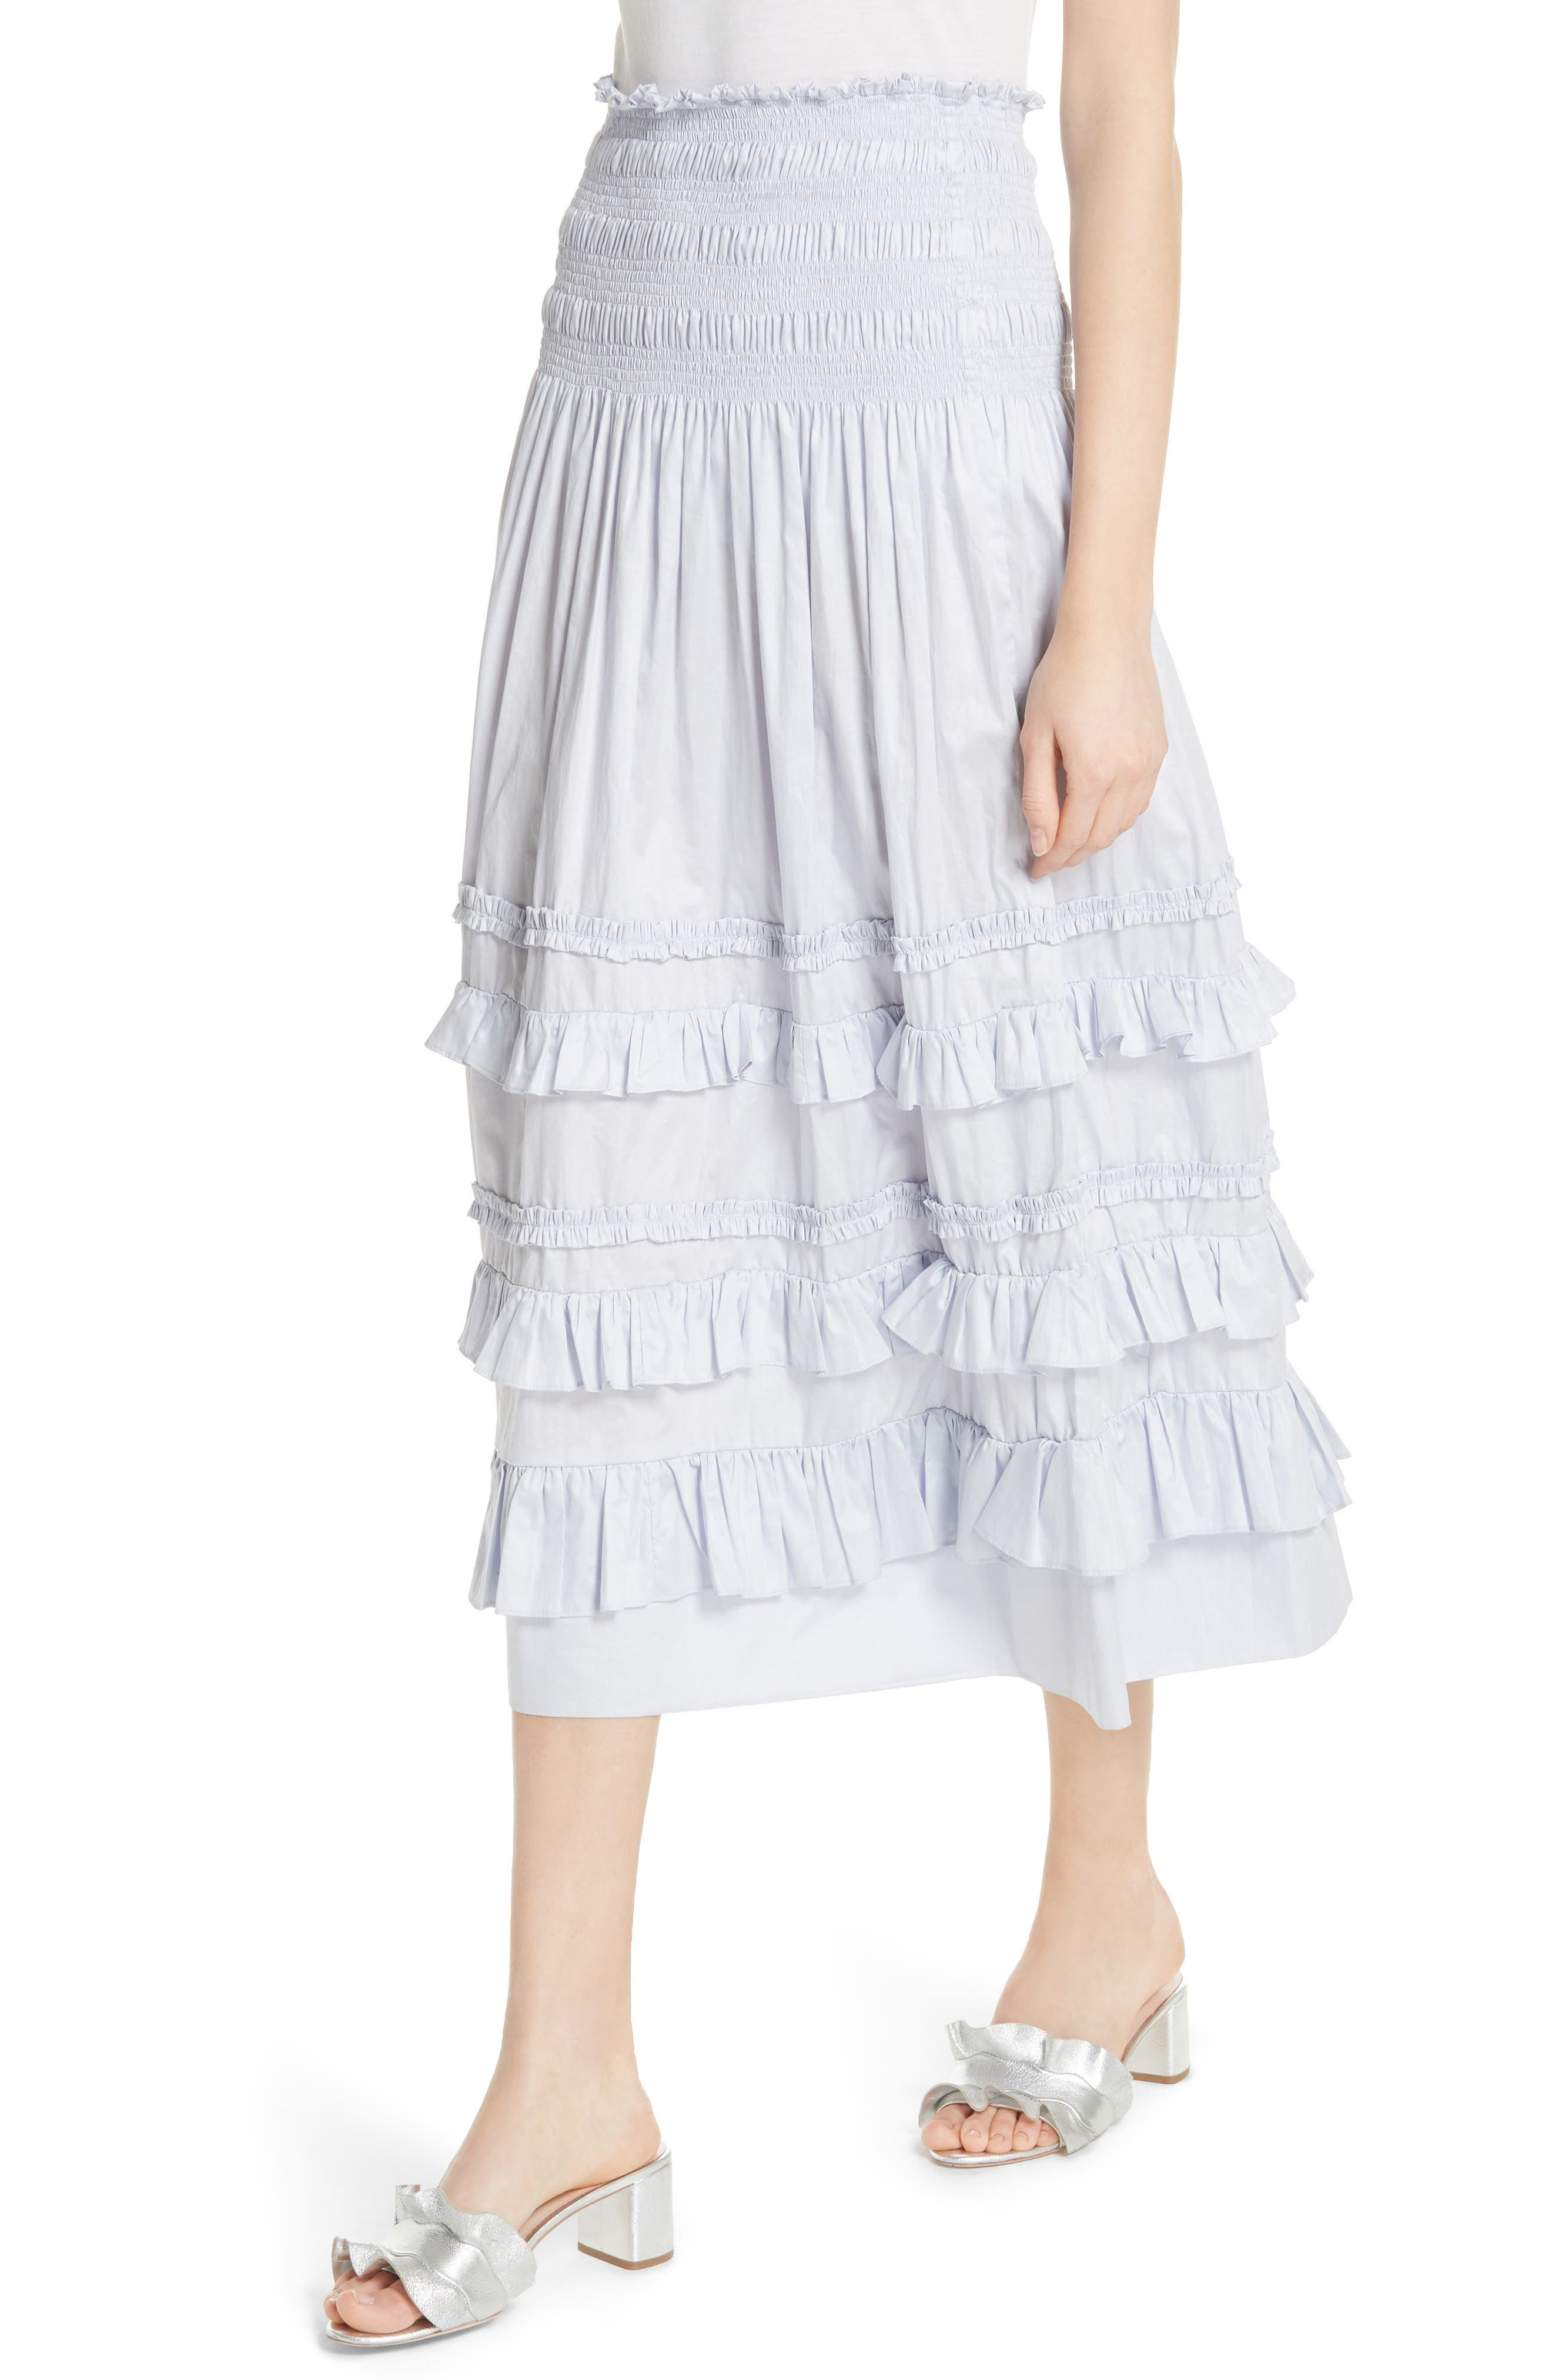 REBECCA TAYLOR, Ruffle Trim Midi Skirt, Alternate thumbnail 4, color, 458